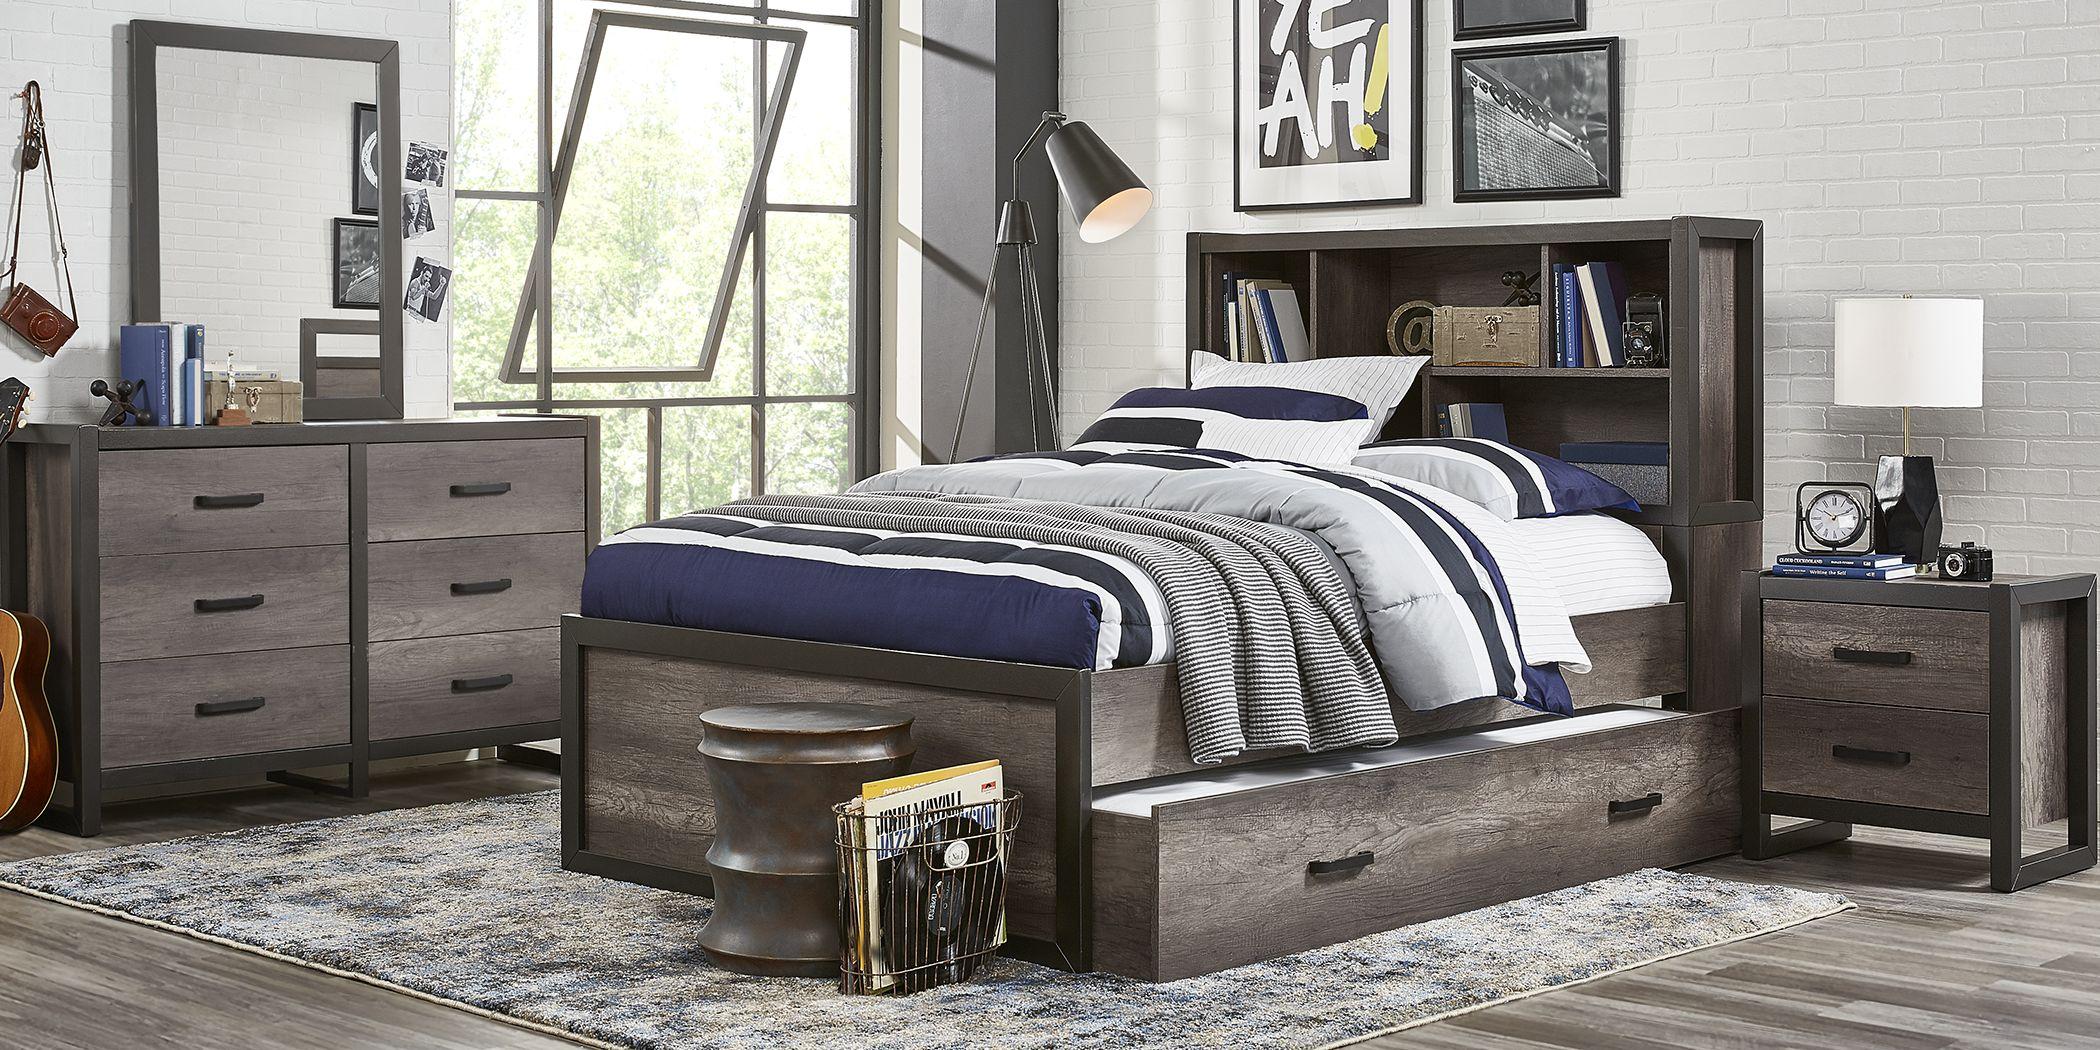 Kids Colefax Avenue Gray 5 Pc Twin Bookcase Bedroom